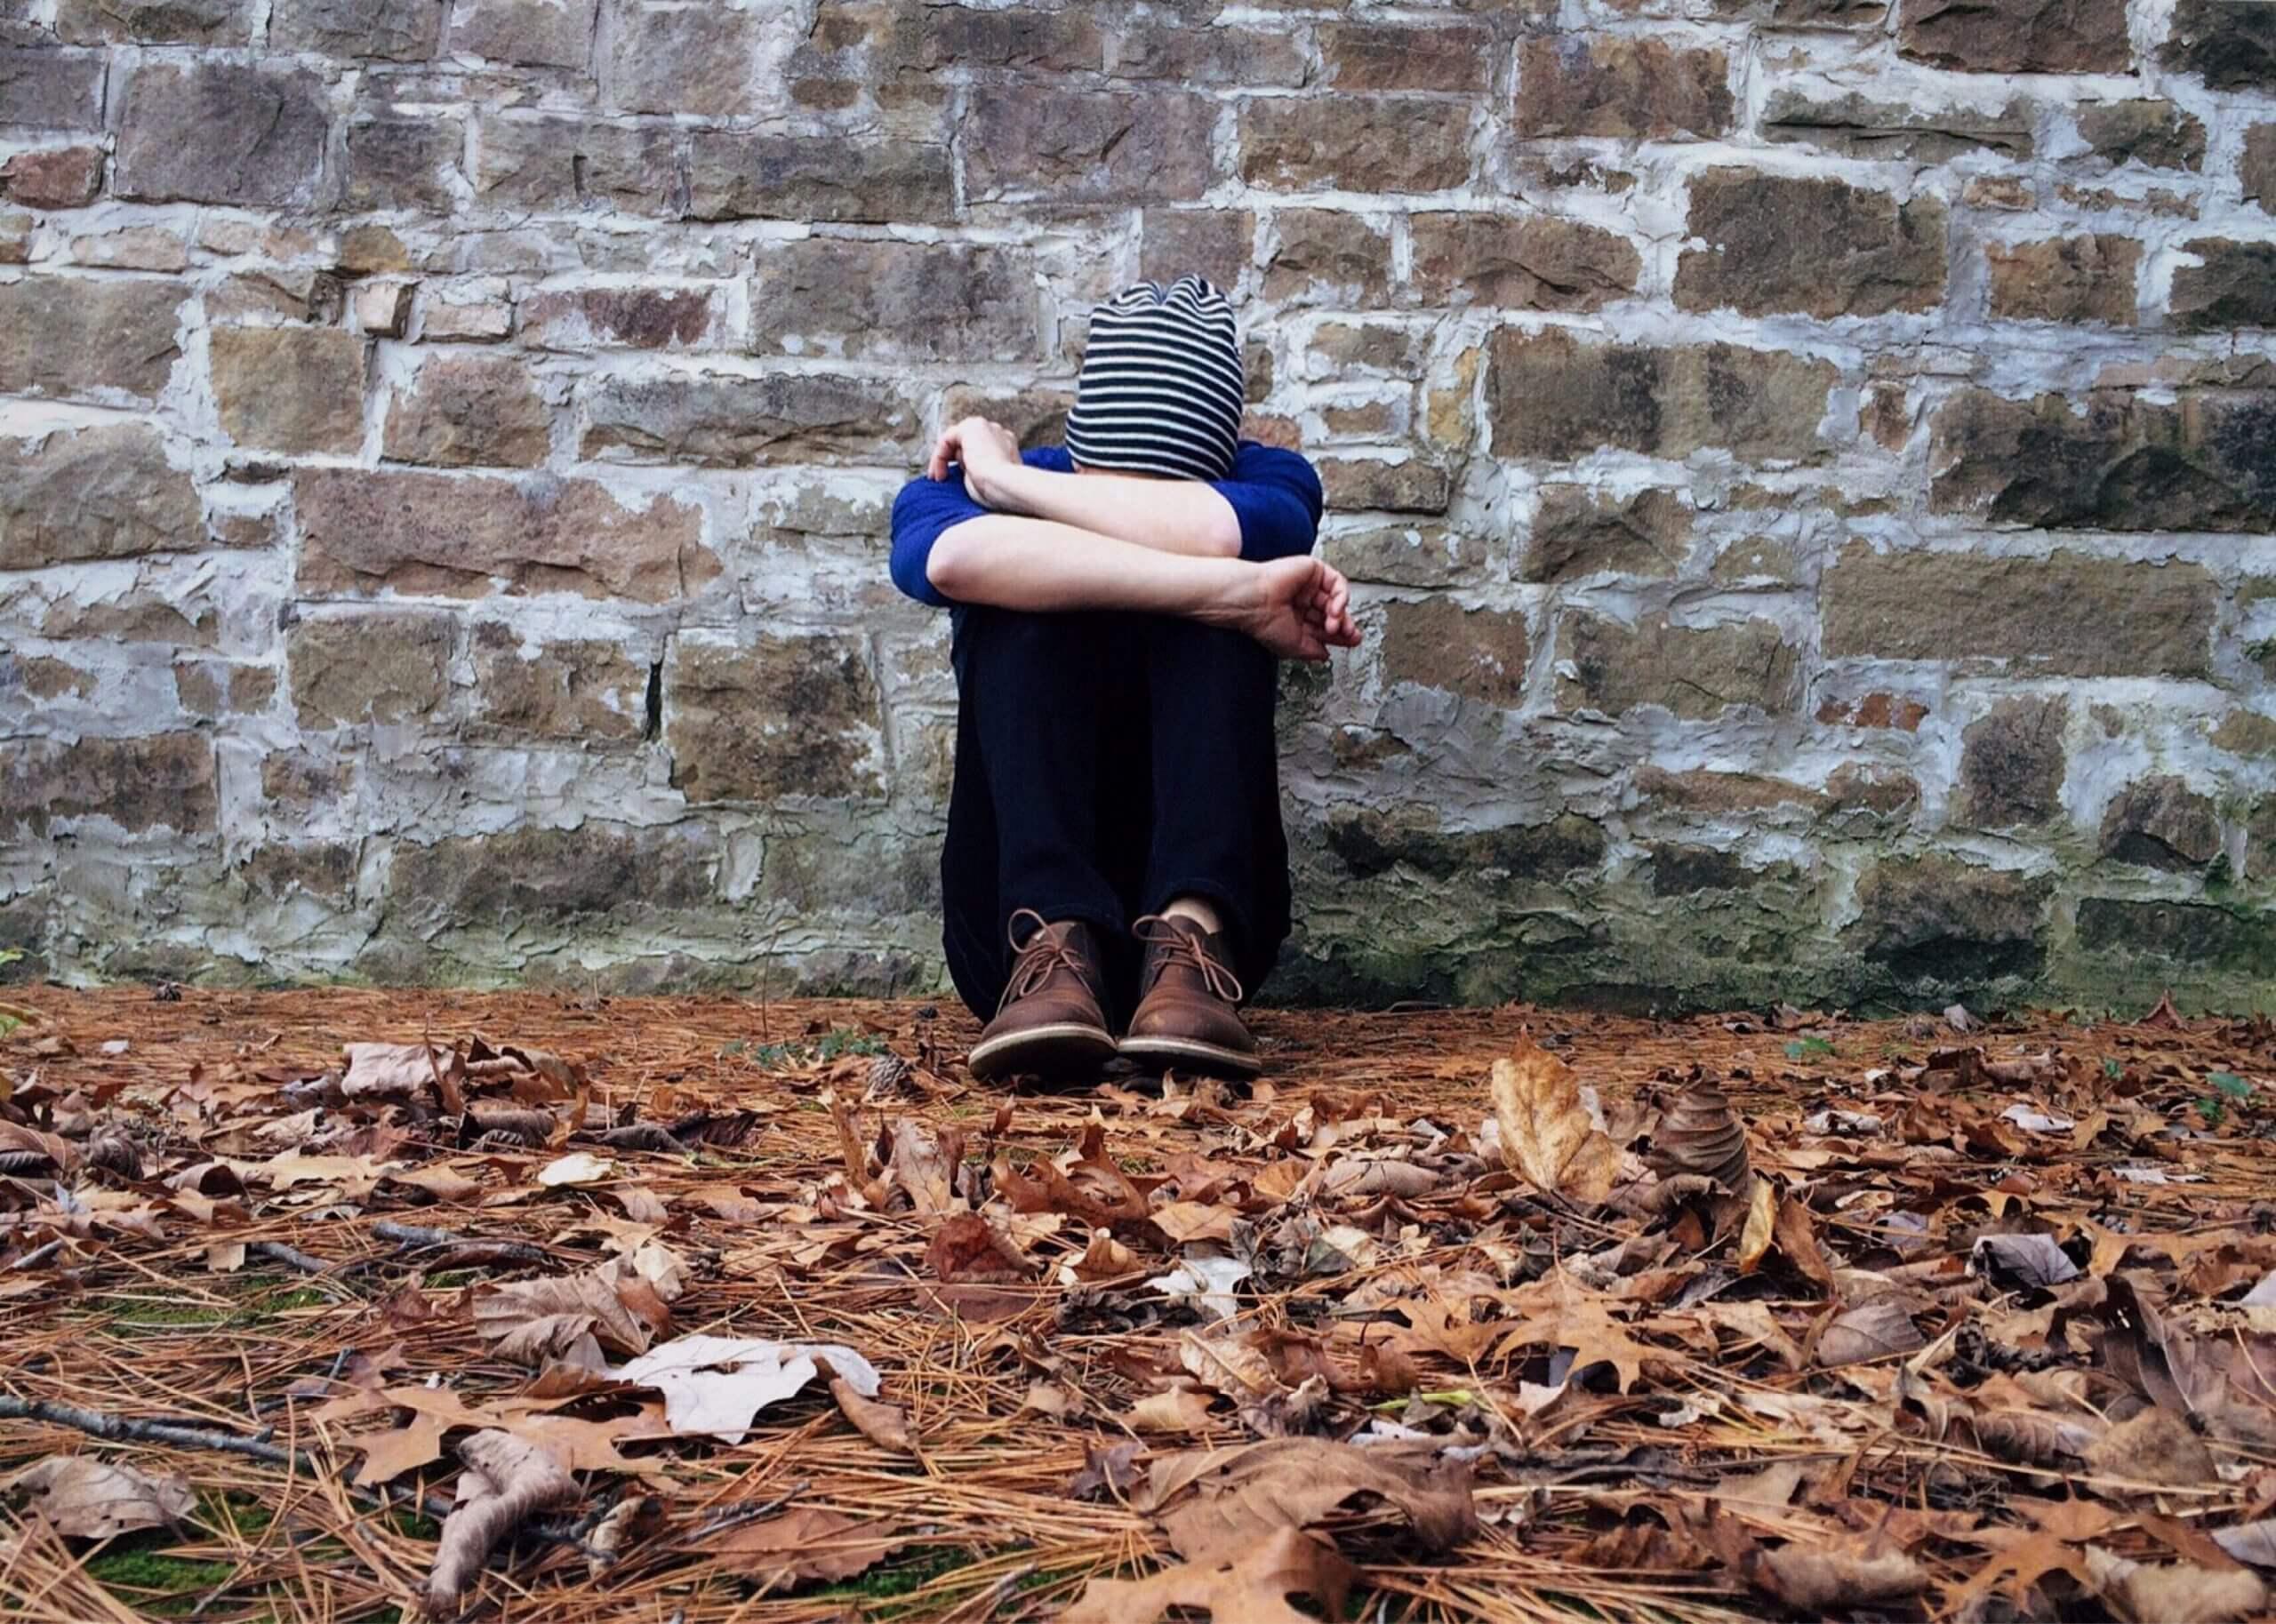 dip neerslachtig somber depressie, Grip op je dip